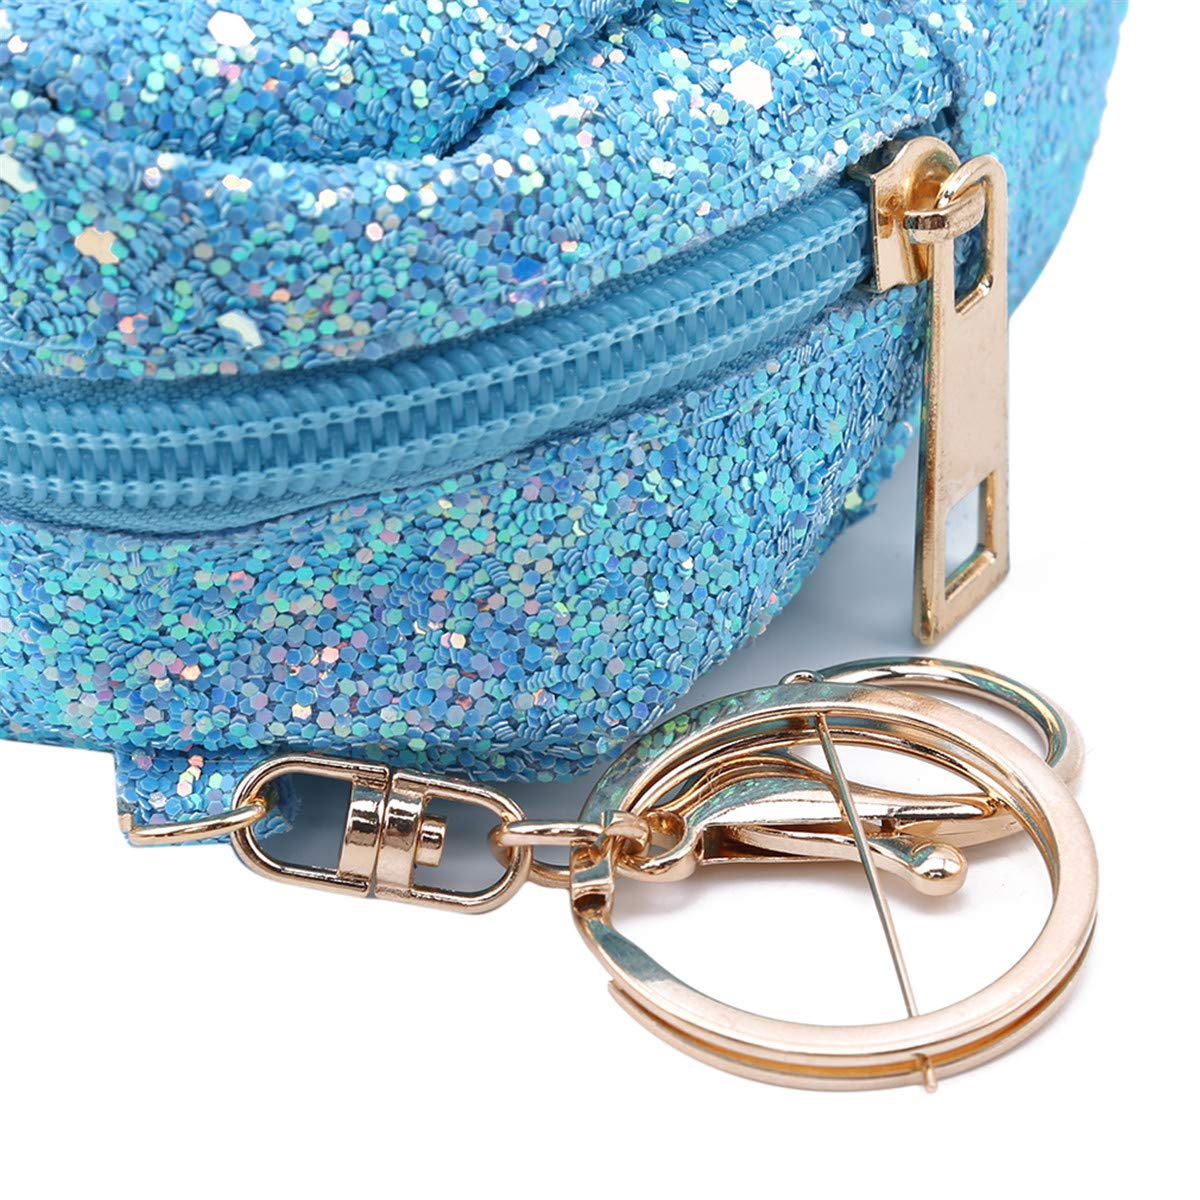 Winwinfly Owl Pattern Keychain Shining Sequins Coin Purse Mini Satchel Trendy Keyring Bag Girl Women,Black